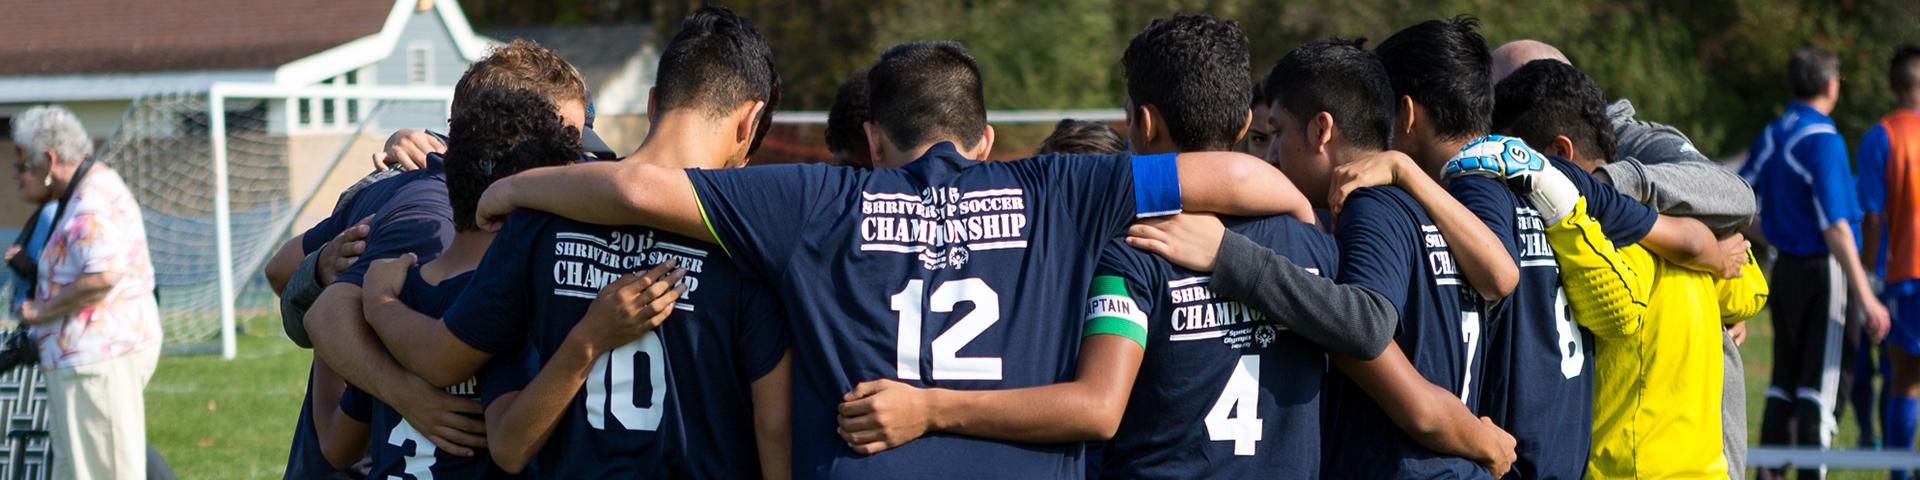 school based unified sports